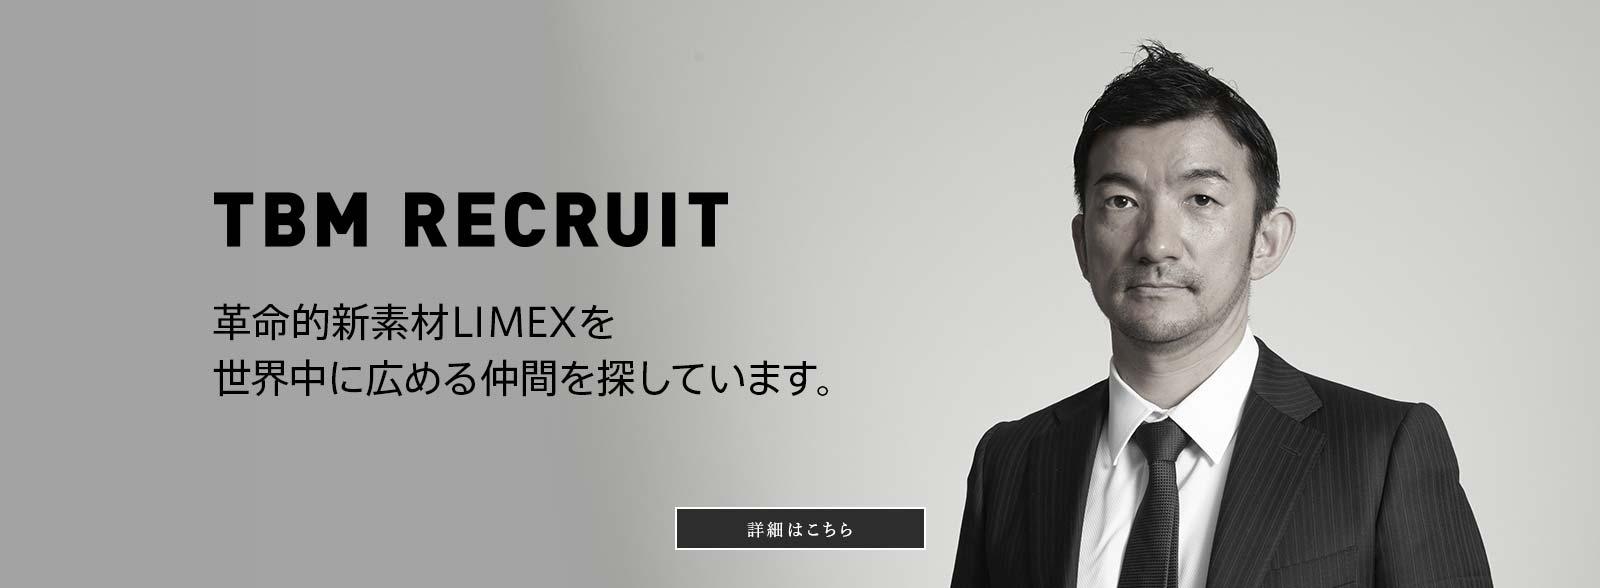 TBM RECRUIT・革命的新素材LIMEXを世界中に広める仲間を探しています。